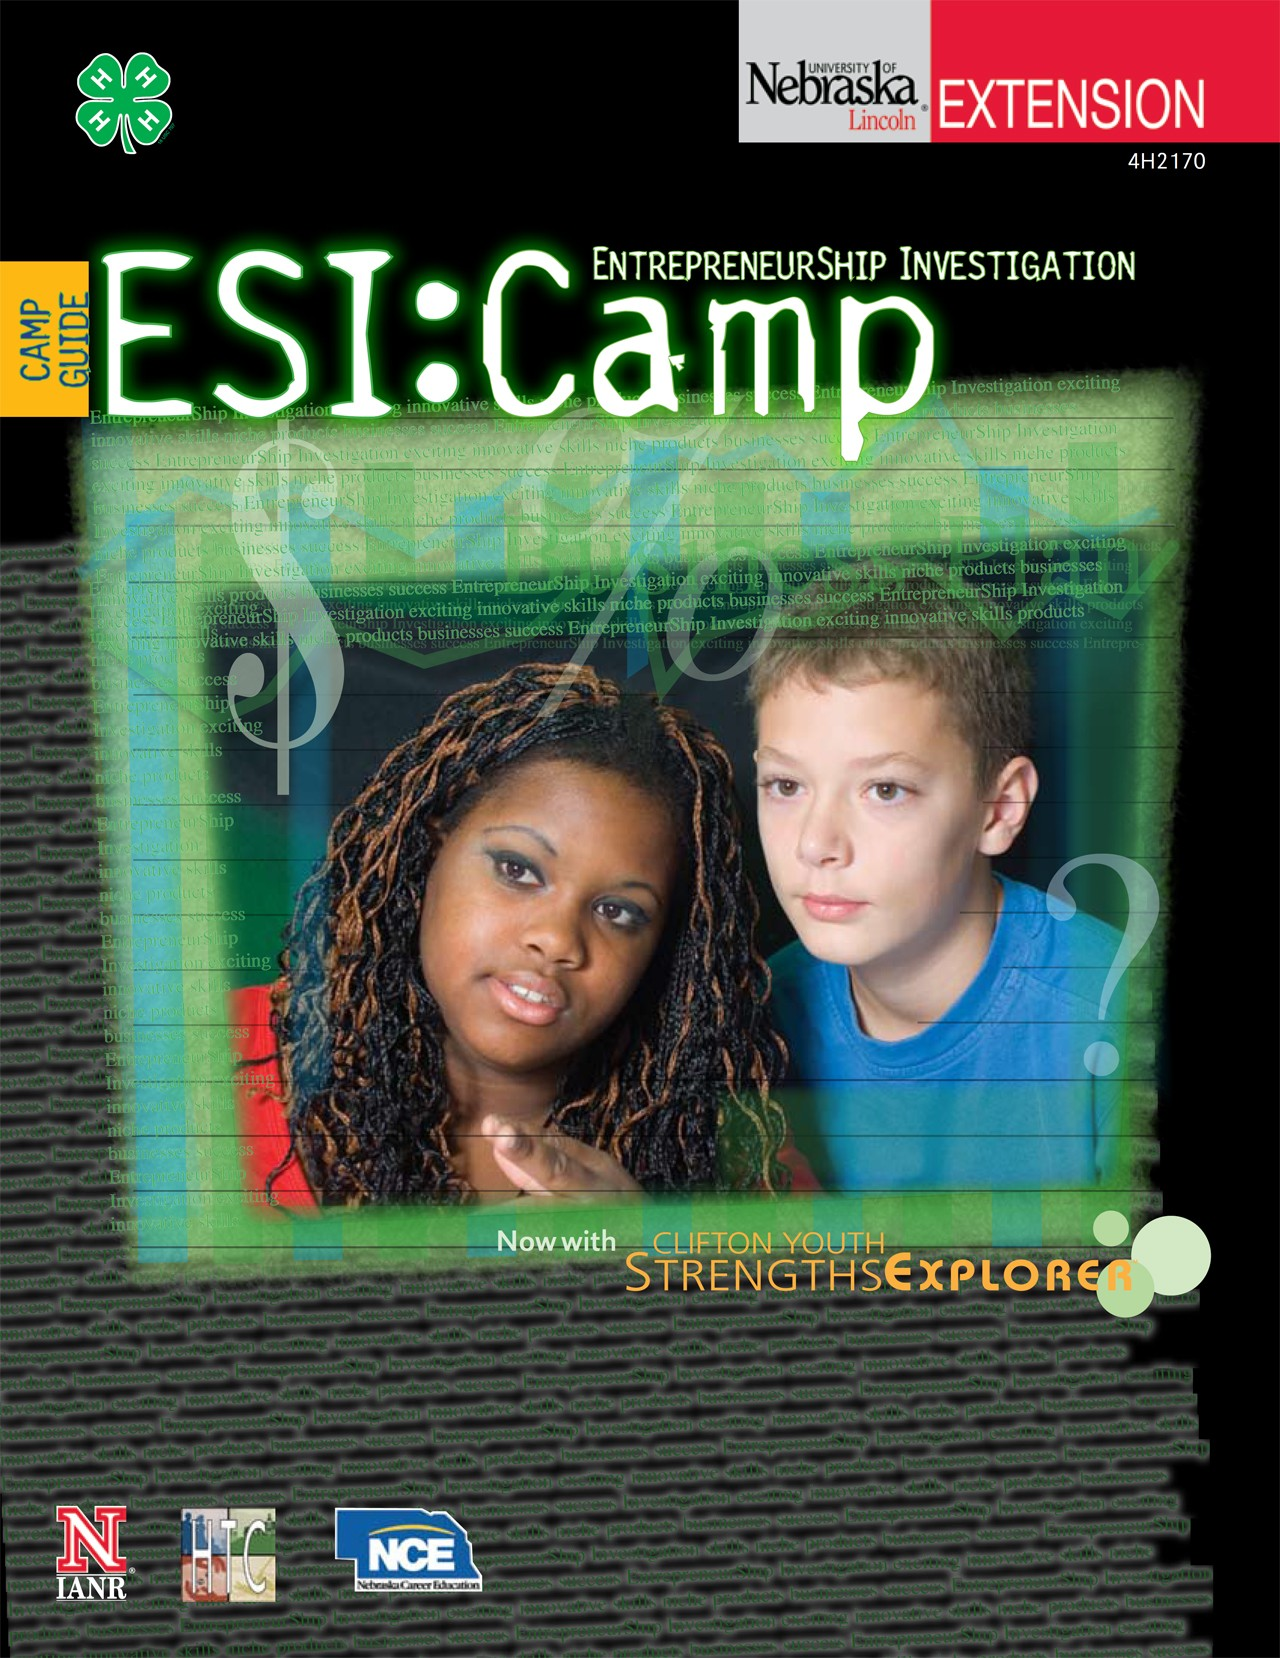 EntrepreneurShip Investigation: Camp Guide